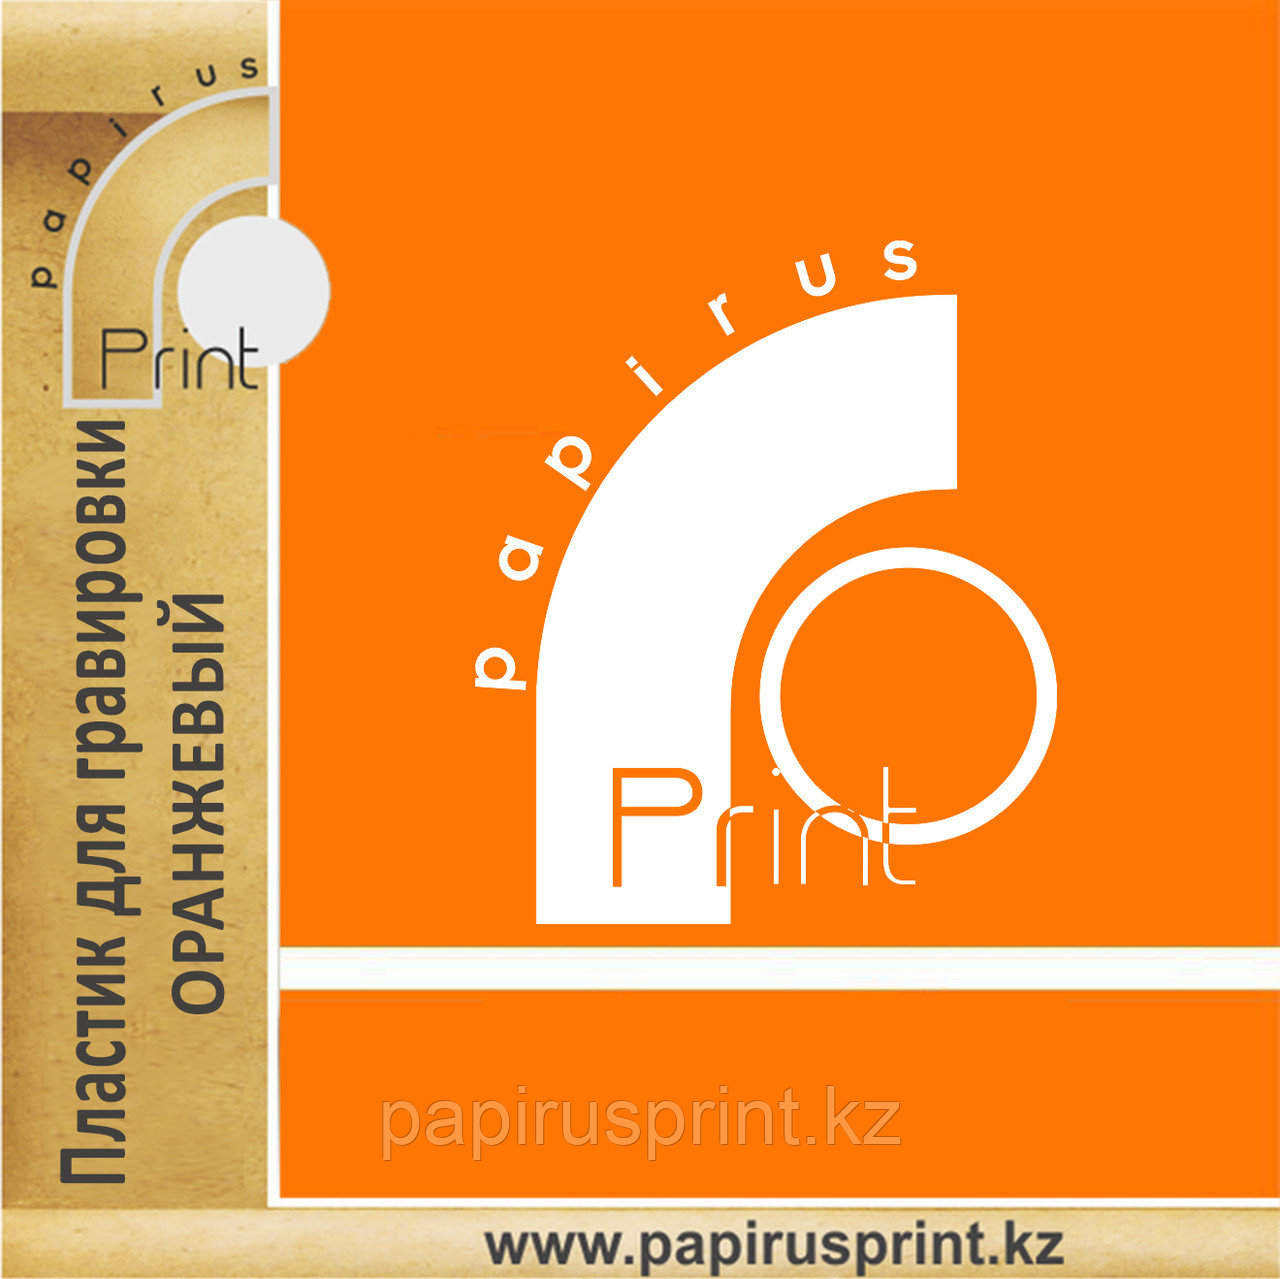 Пластик для гравировки (Оранжевый) 1,2м х 0,6м